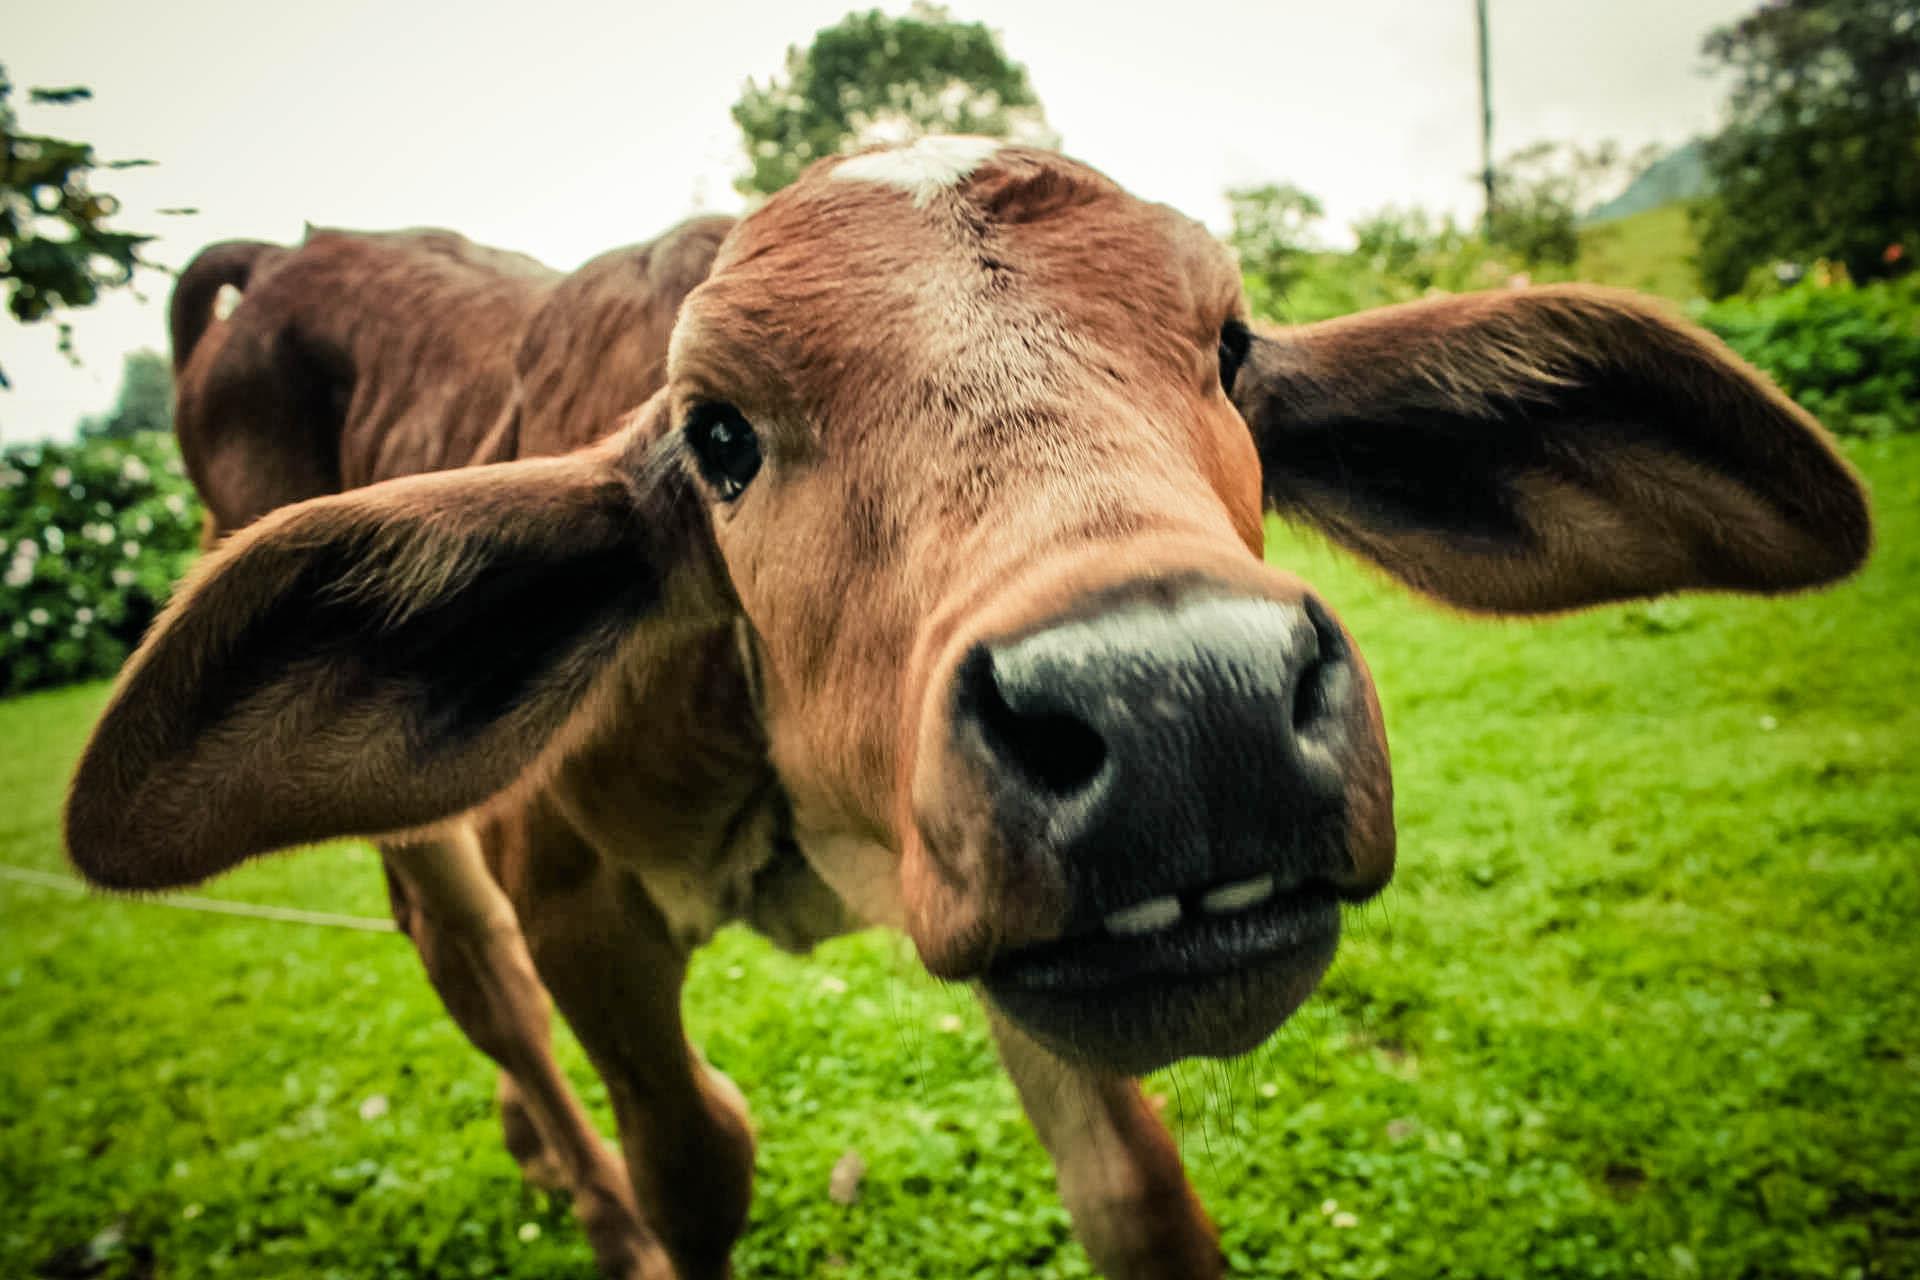 Cow, Animals, Calf, Head, Nature, HQ Photo